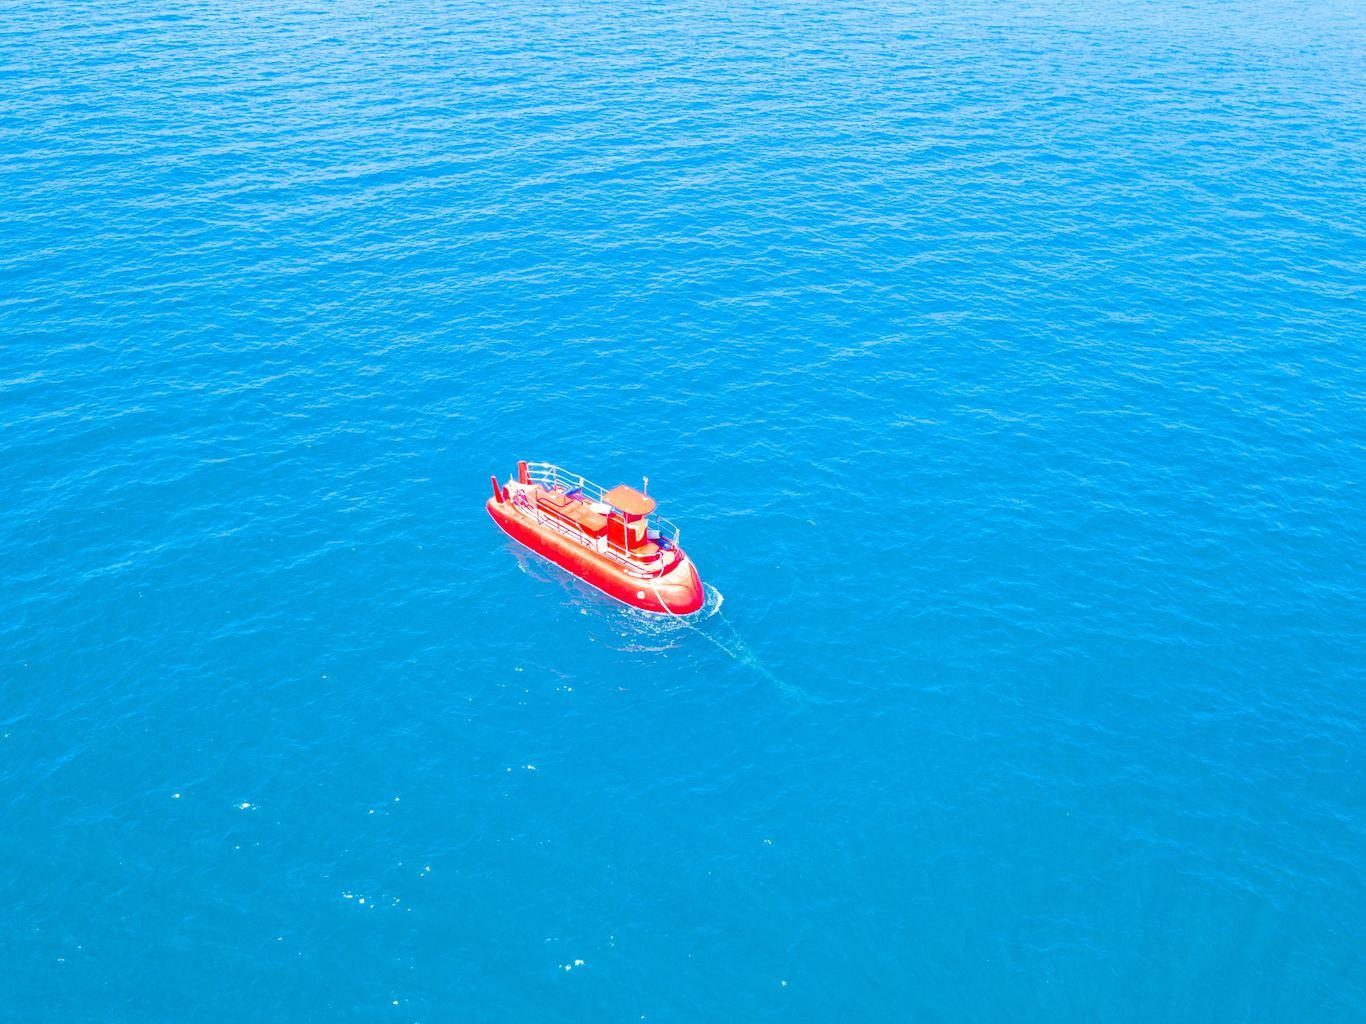 Joali's Submarine